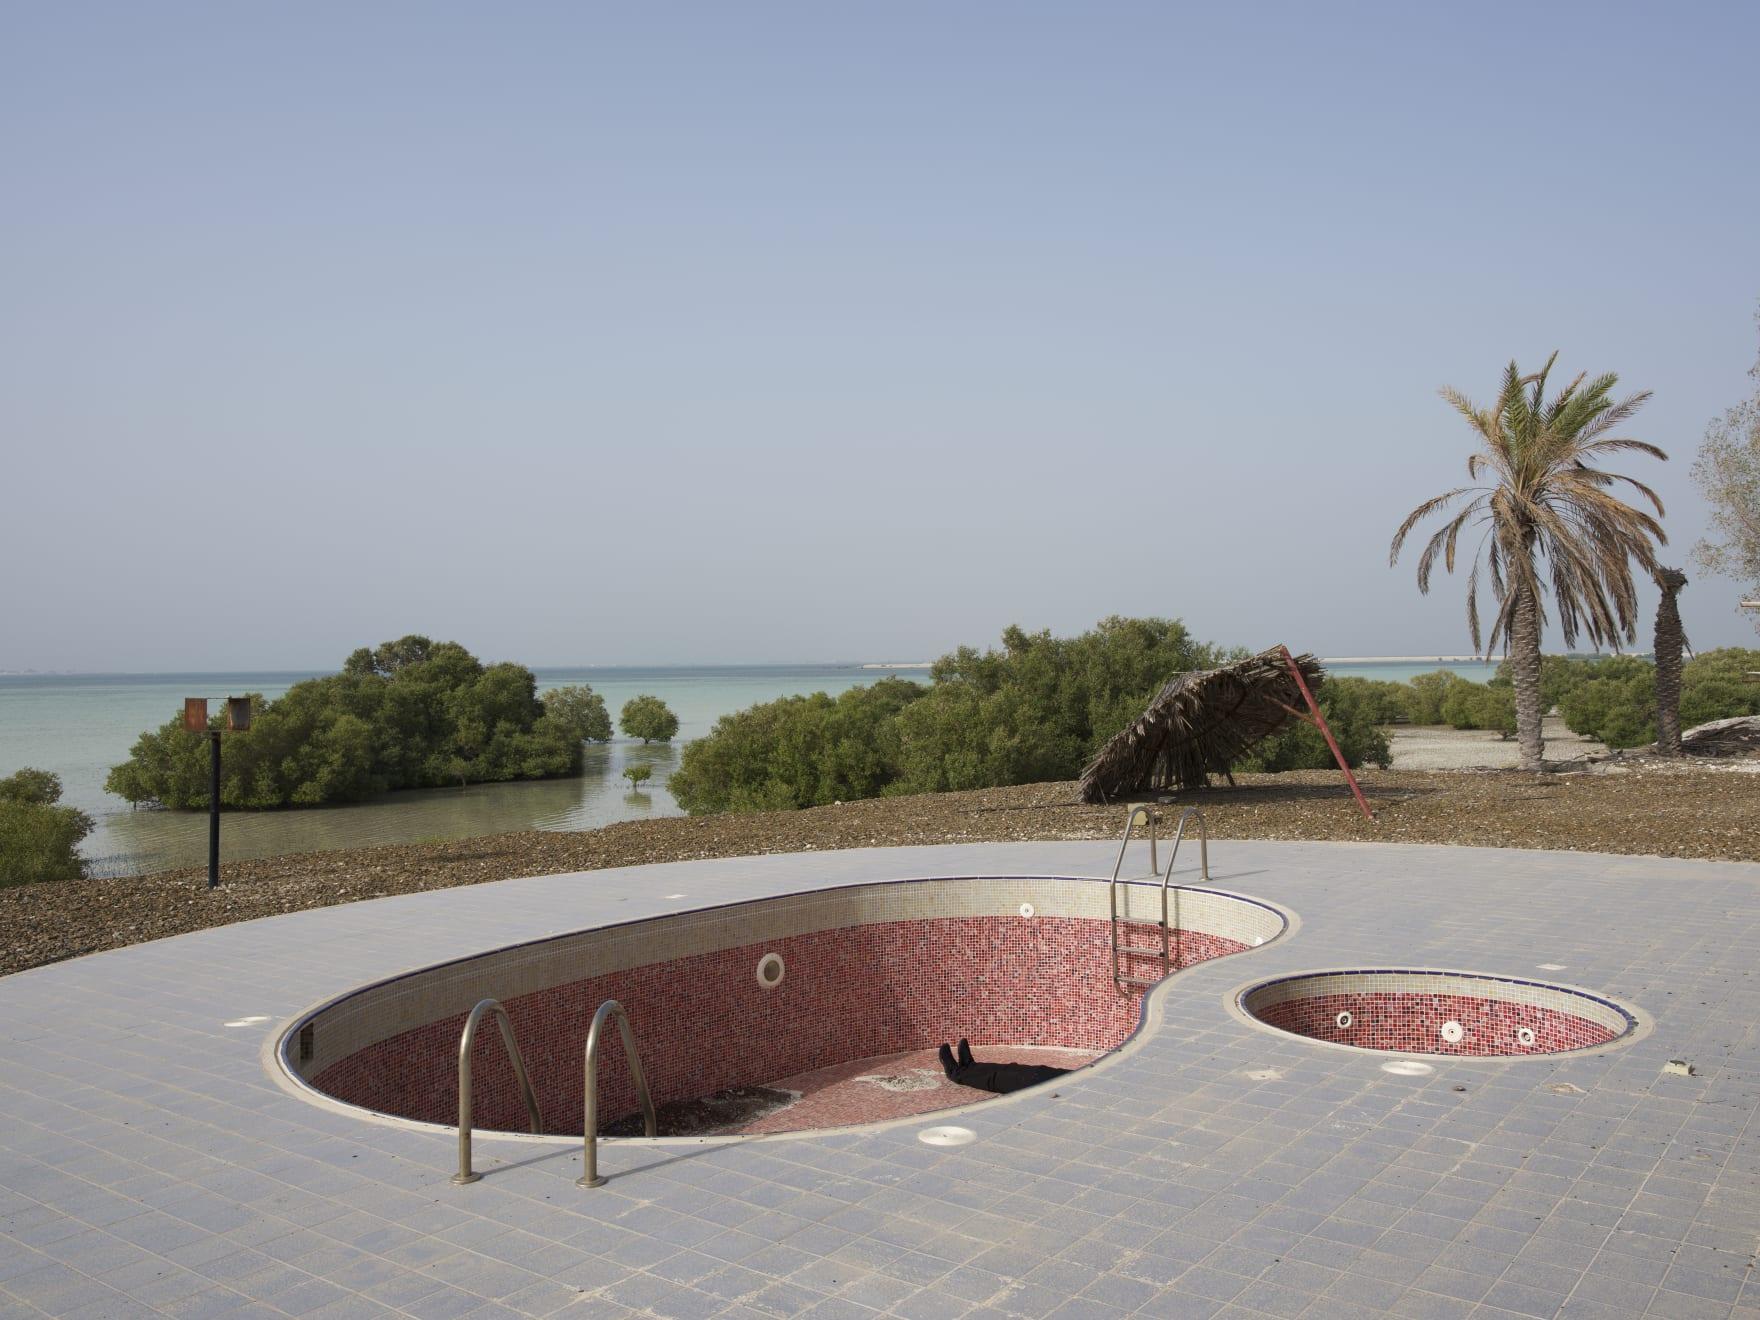 Tarek Al-Ghoussein, Abu Dhabi Archipelago (Al Jubail), 2015-, Digital Print, 60 x 80cm, Edition of 6 + 1AP USD 8,000 (Excluding VAT)